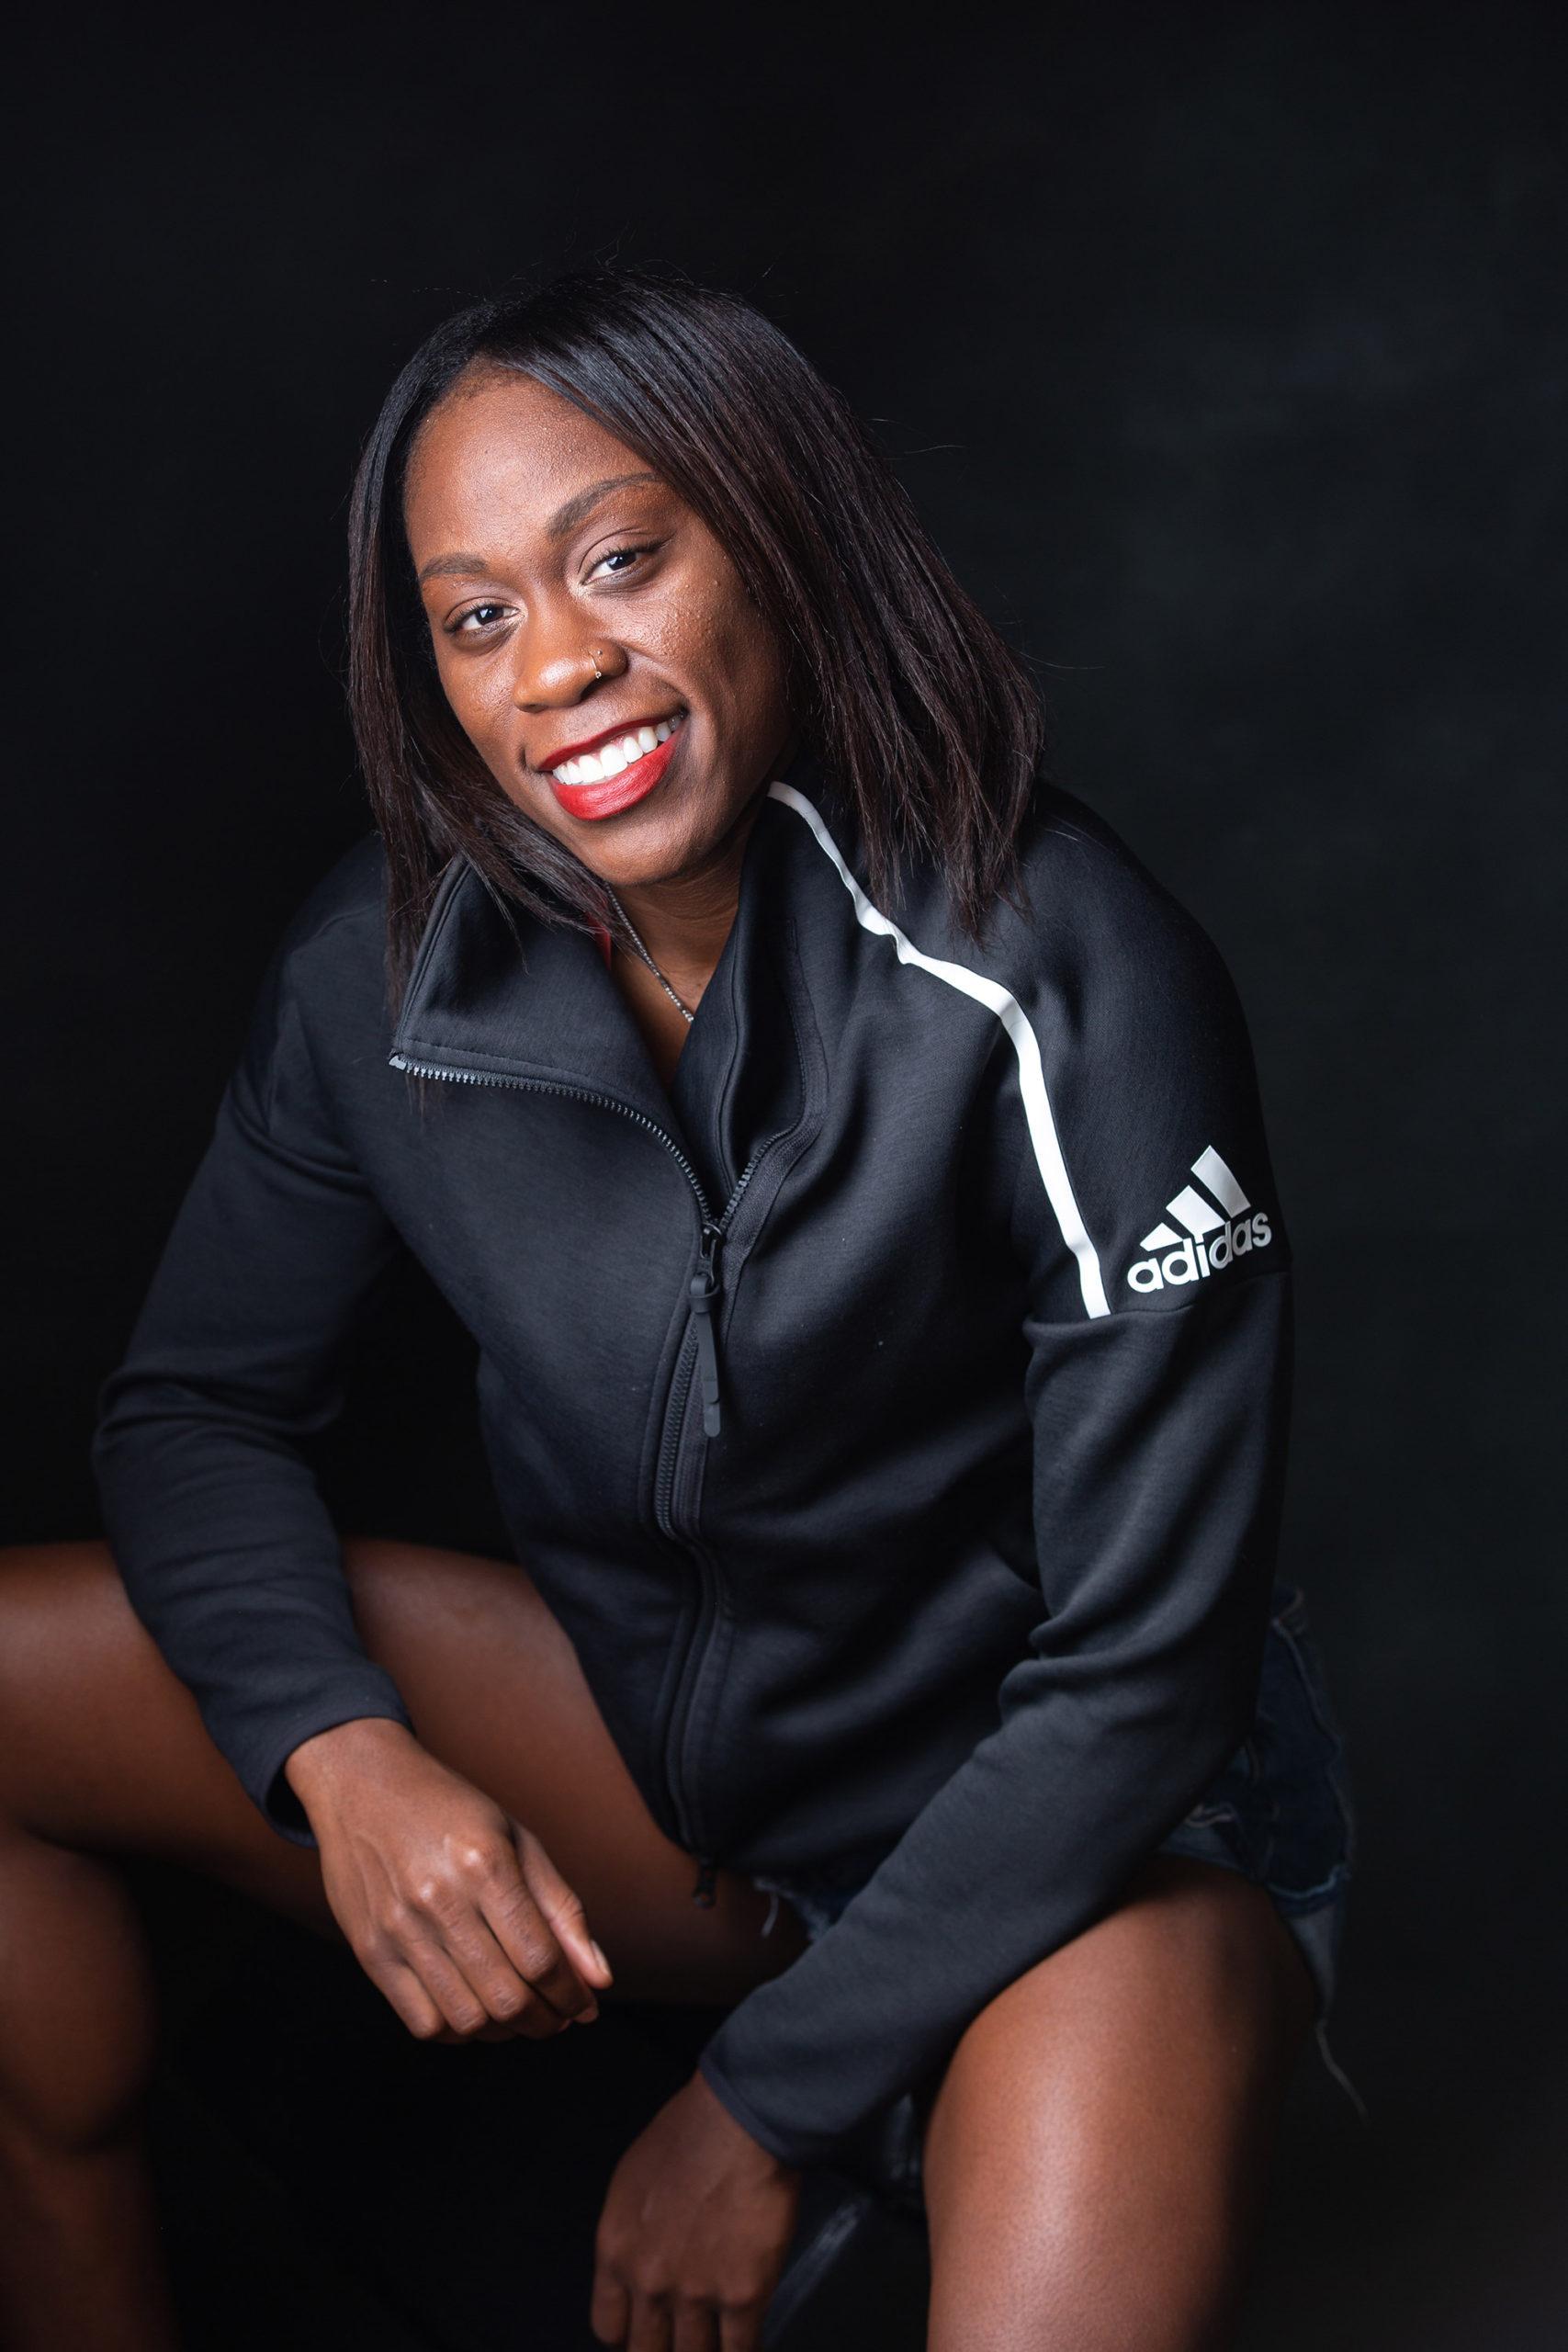 Jessica Beard, World Champion 4×400 M Relay